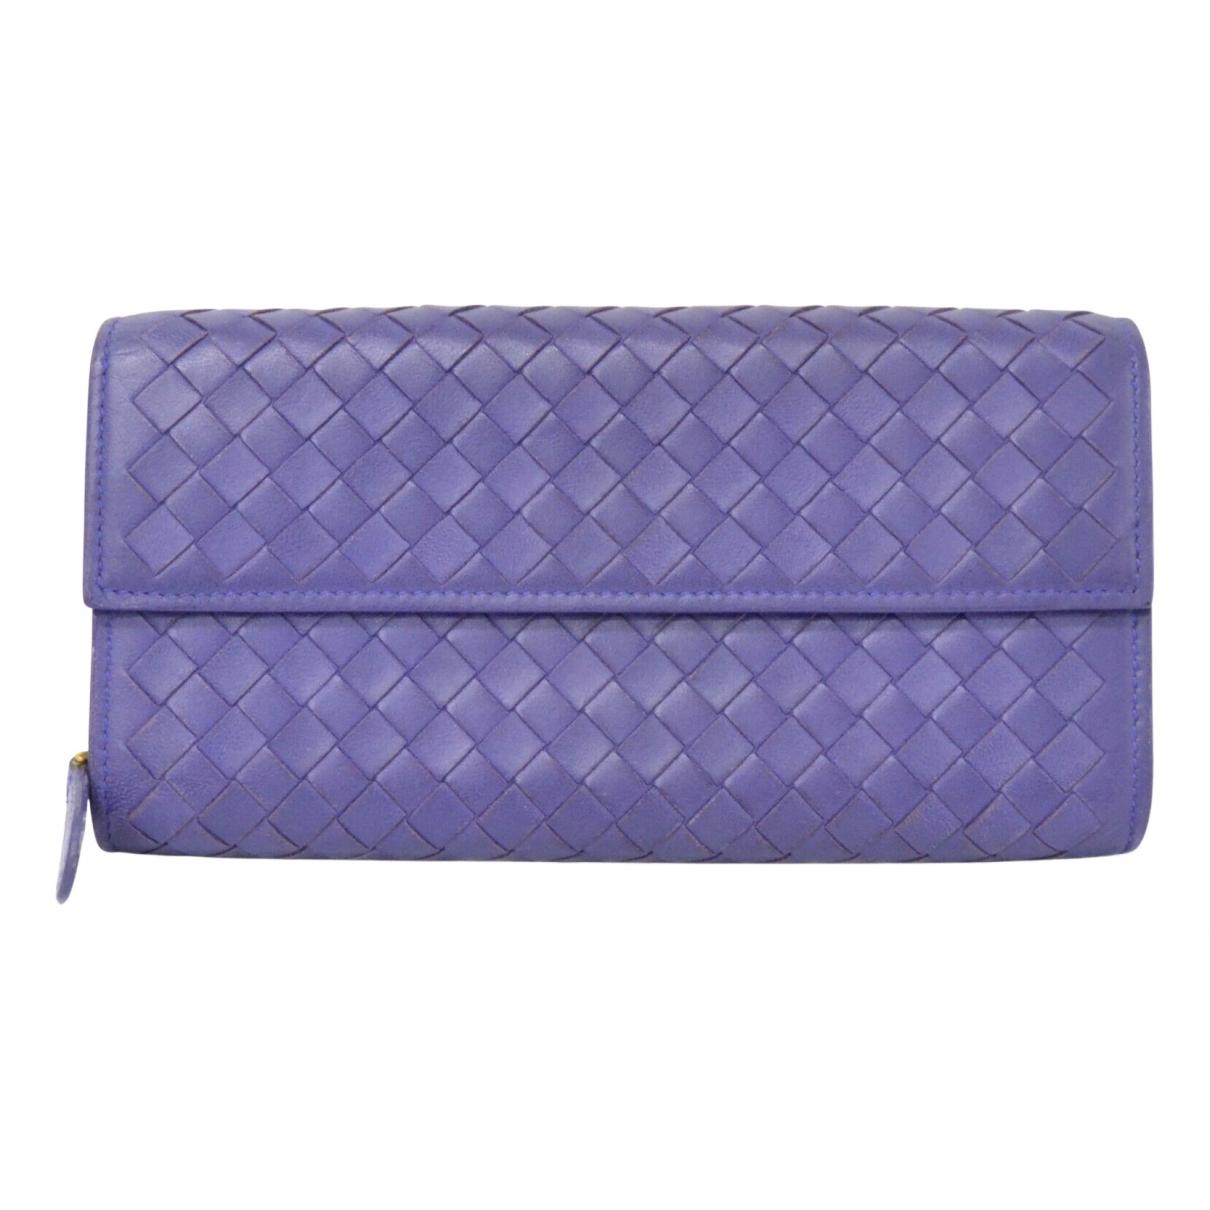 Bottega Veneta N Purple Leather wallet for Women N